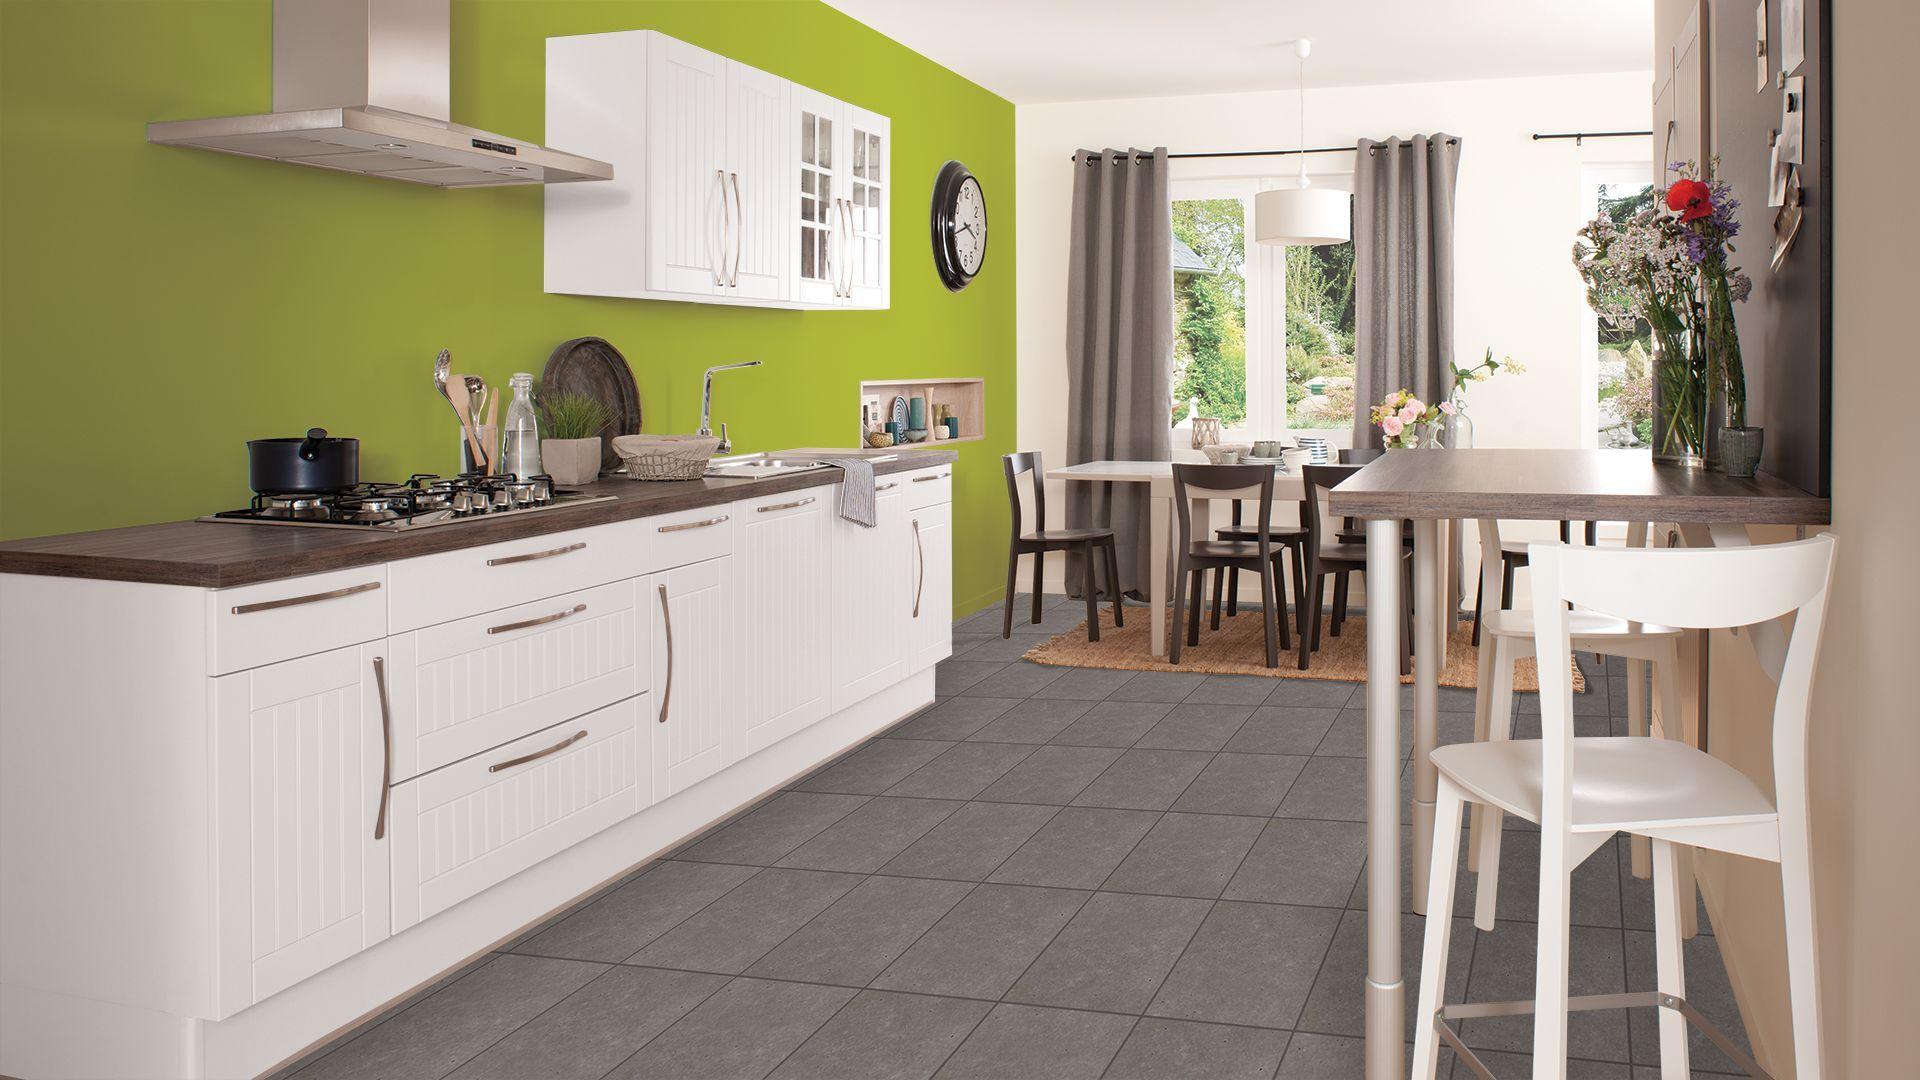 Photo cuisine mur vert anis